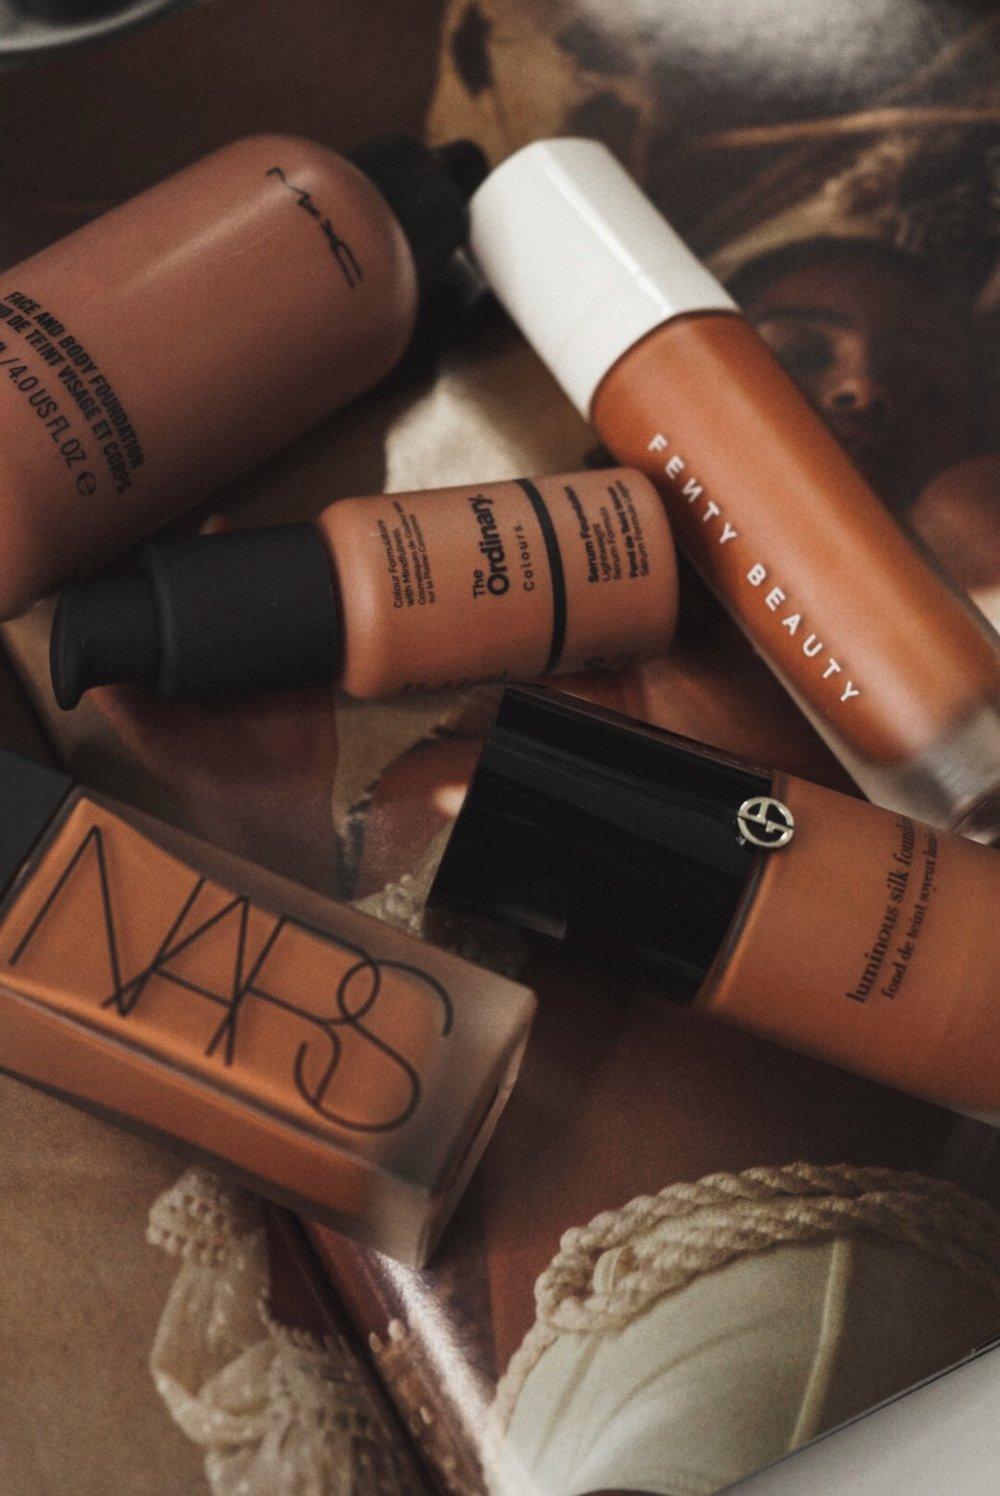 TashaJames-TheGlossier-Top-Foundations-Makeup-31.JPG